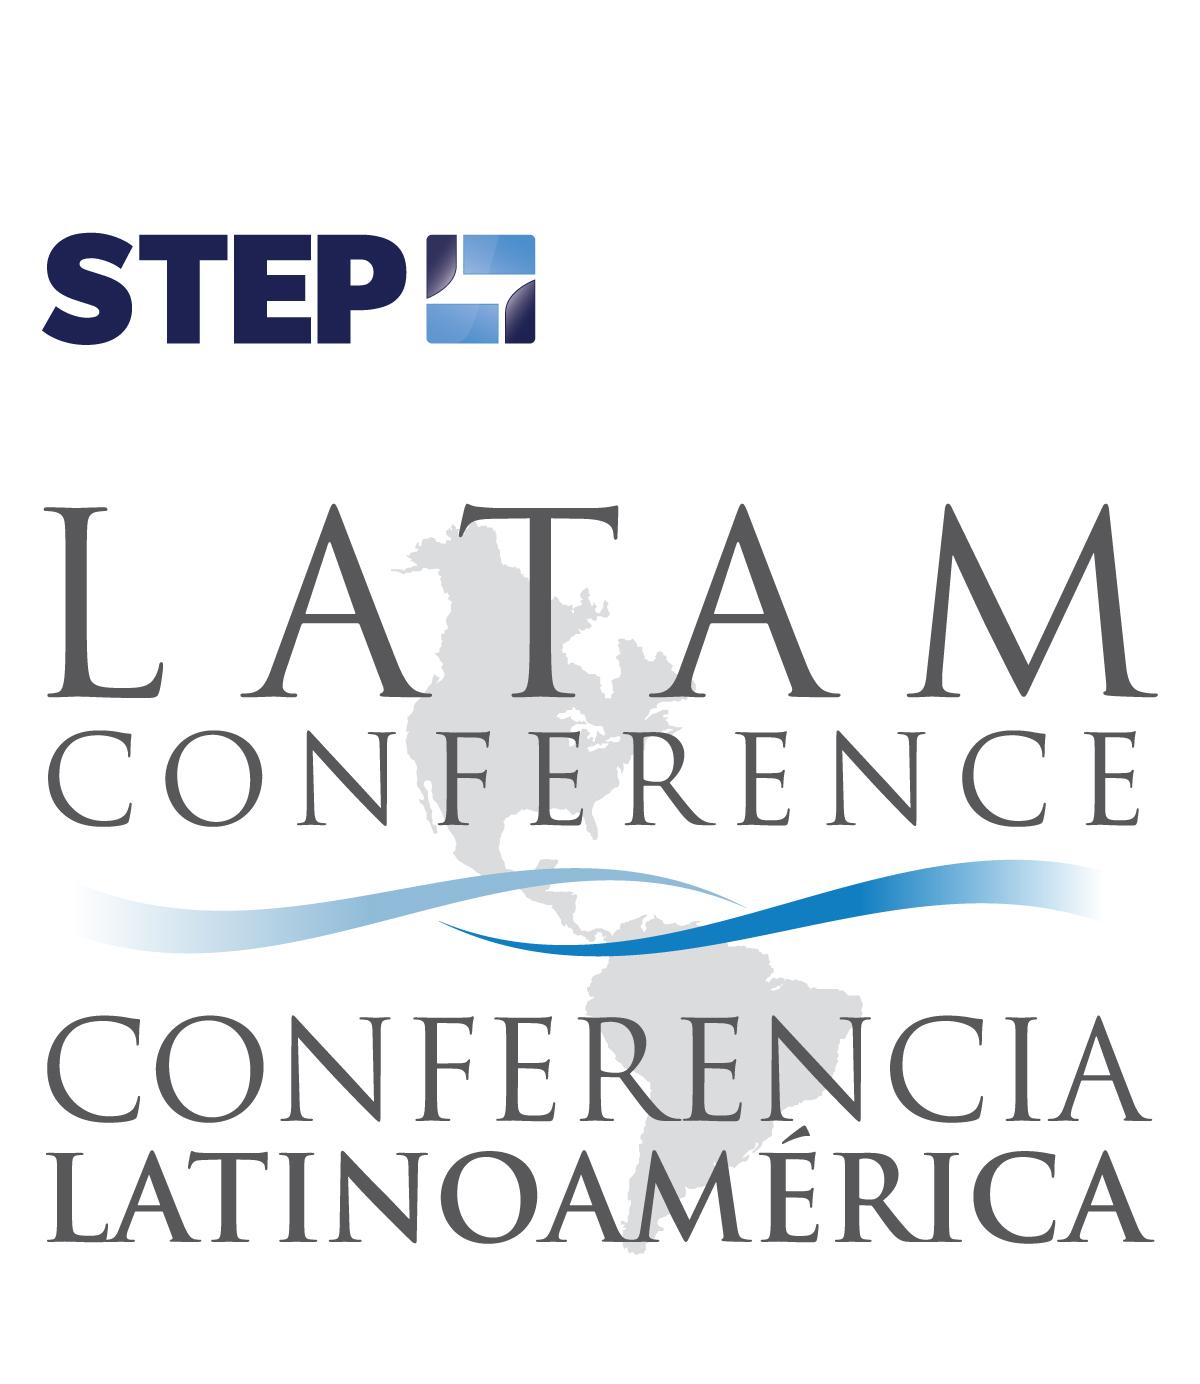 STEPLatAm-Logo-Generic.jpg